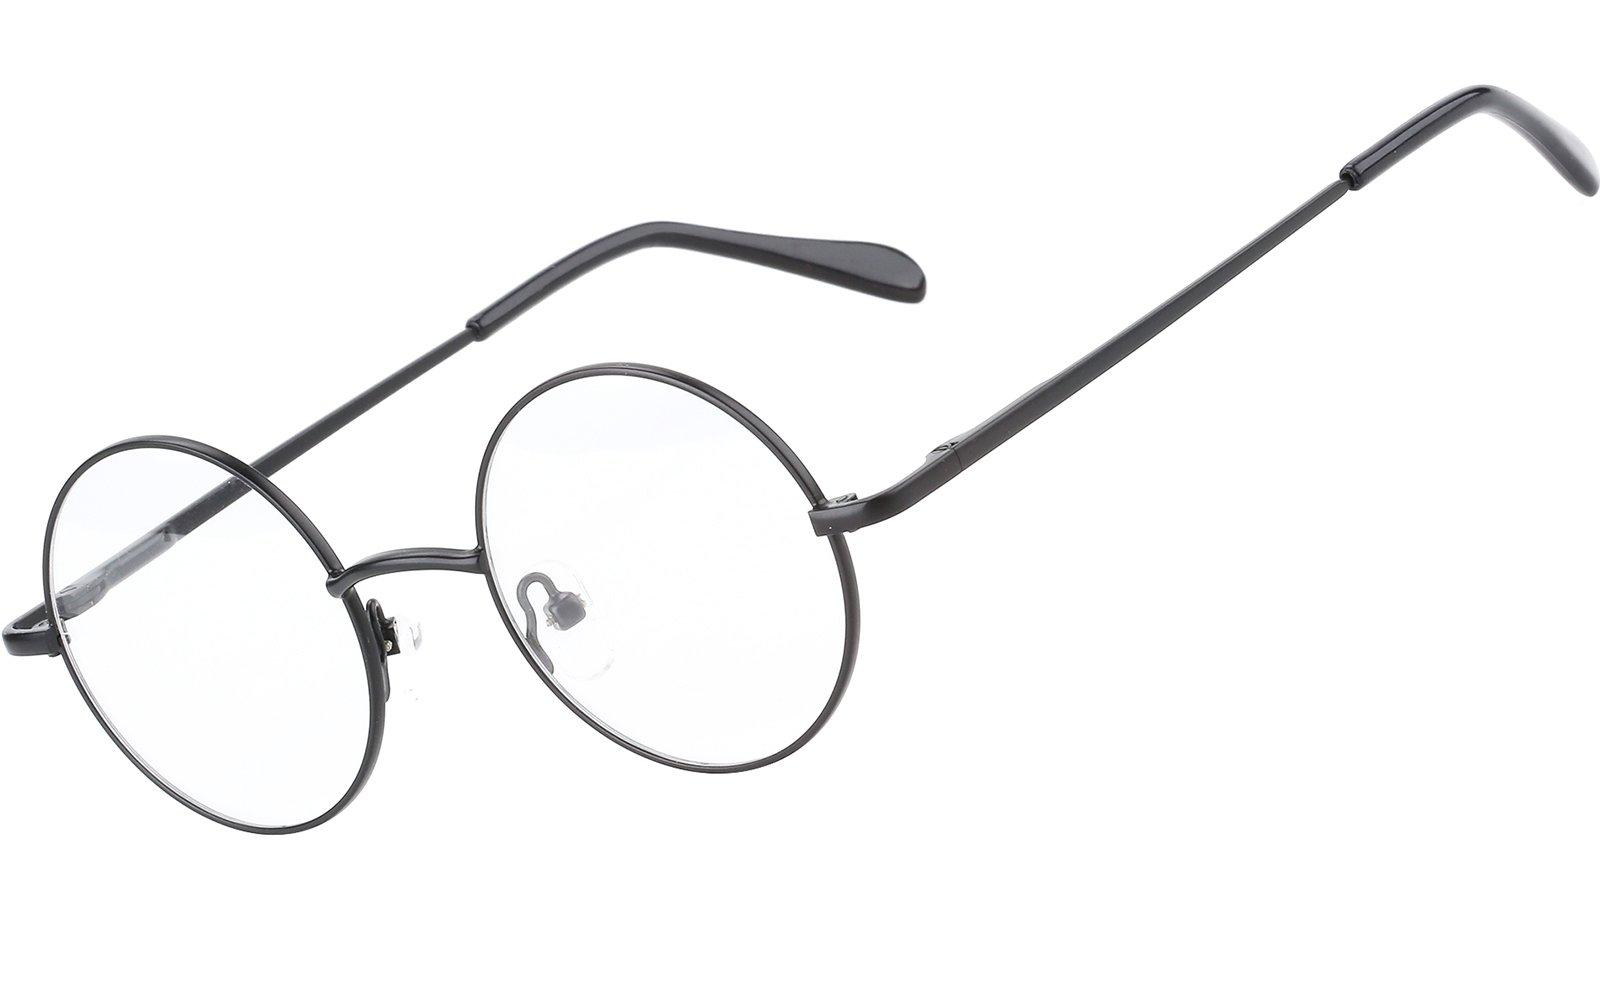 Agstum Retro Round Prescription ready Metal Eyeglass Frame (Small Size) (Black) by Agstum